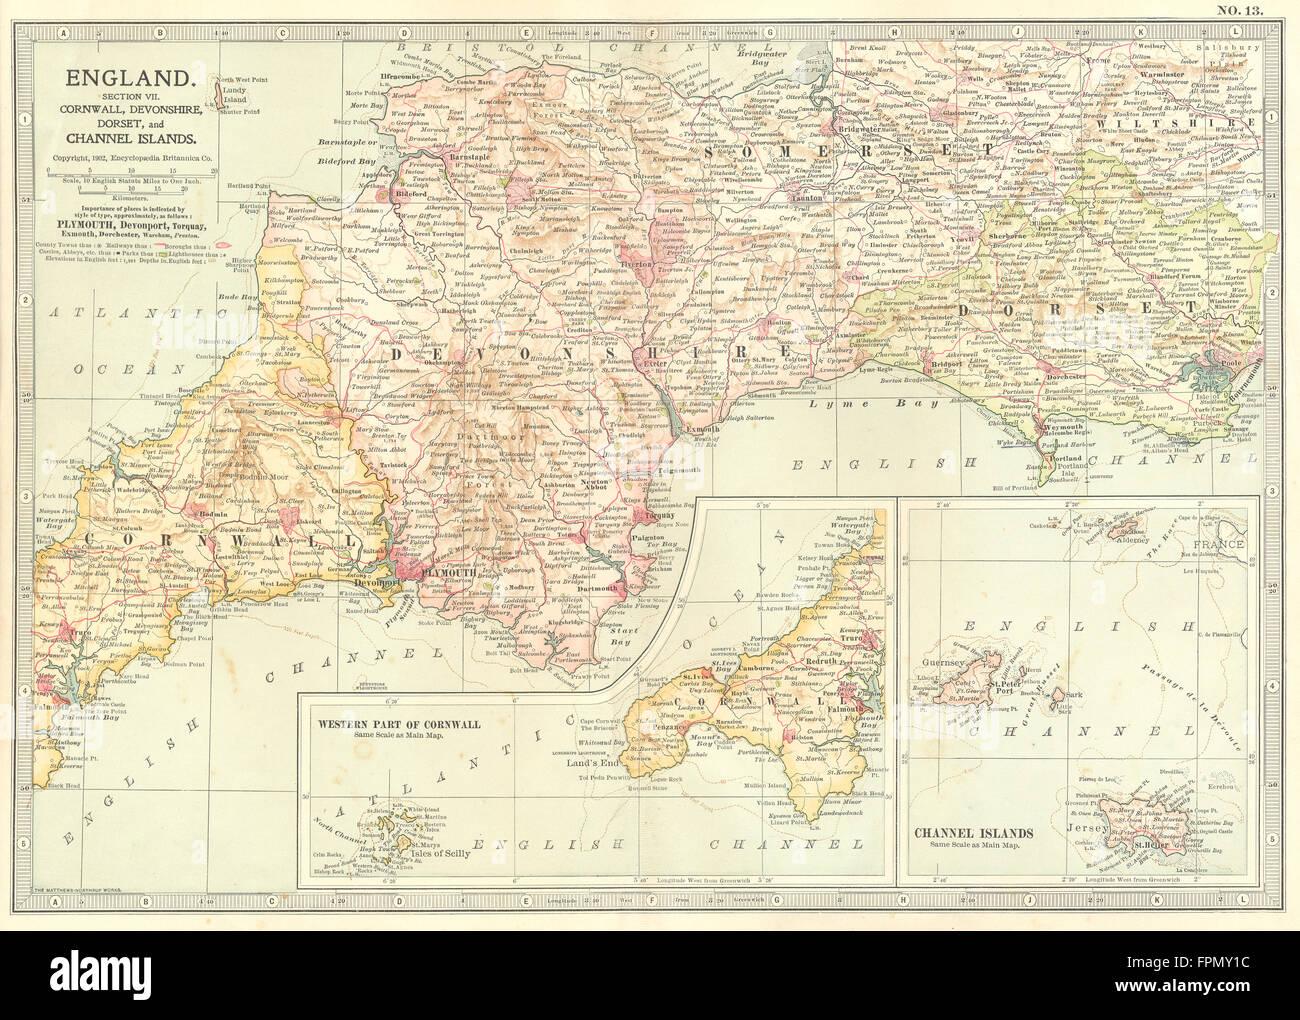 South Devon England Map.South West England Cornwall Devon Dorset Somerset Channel Islands